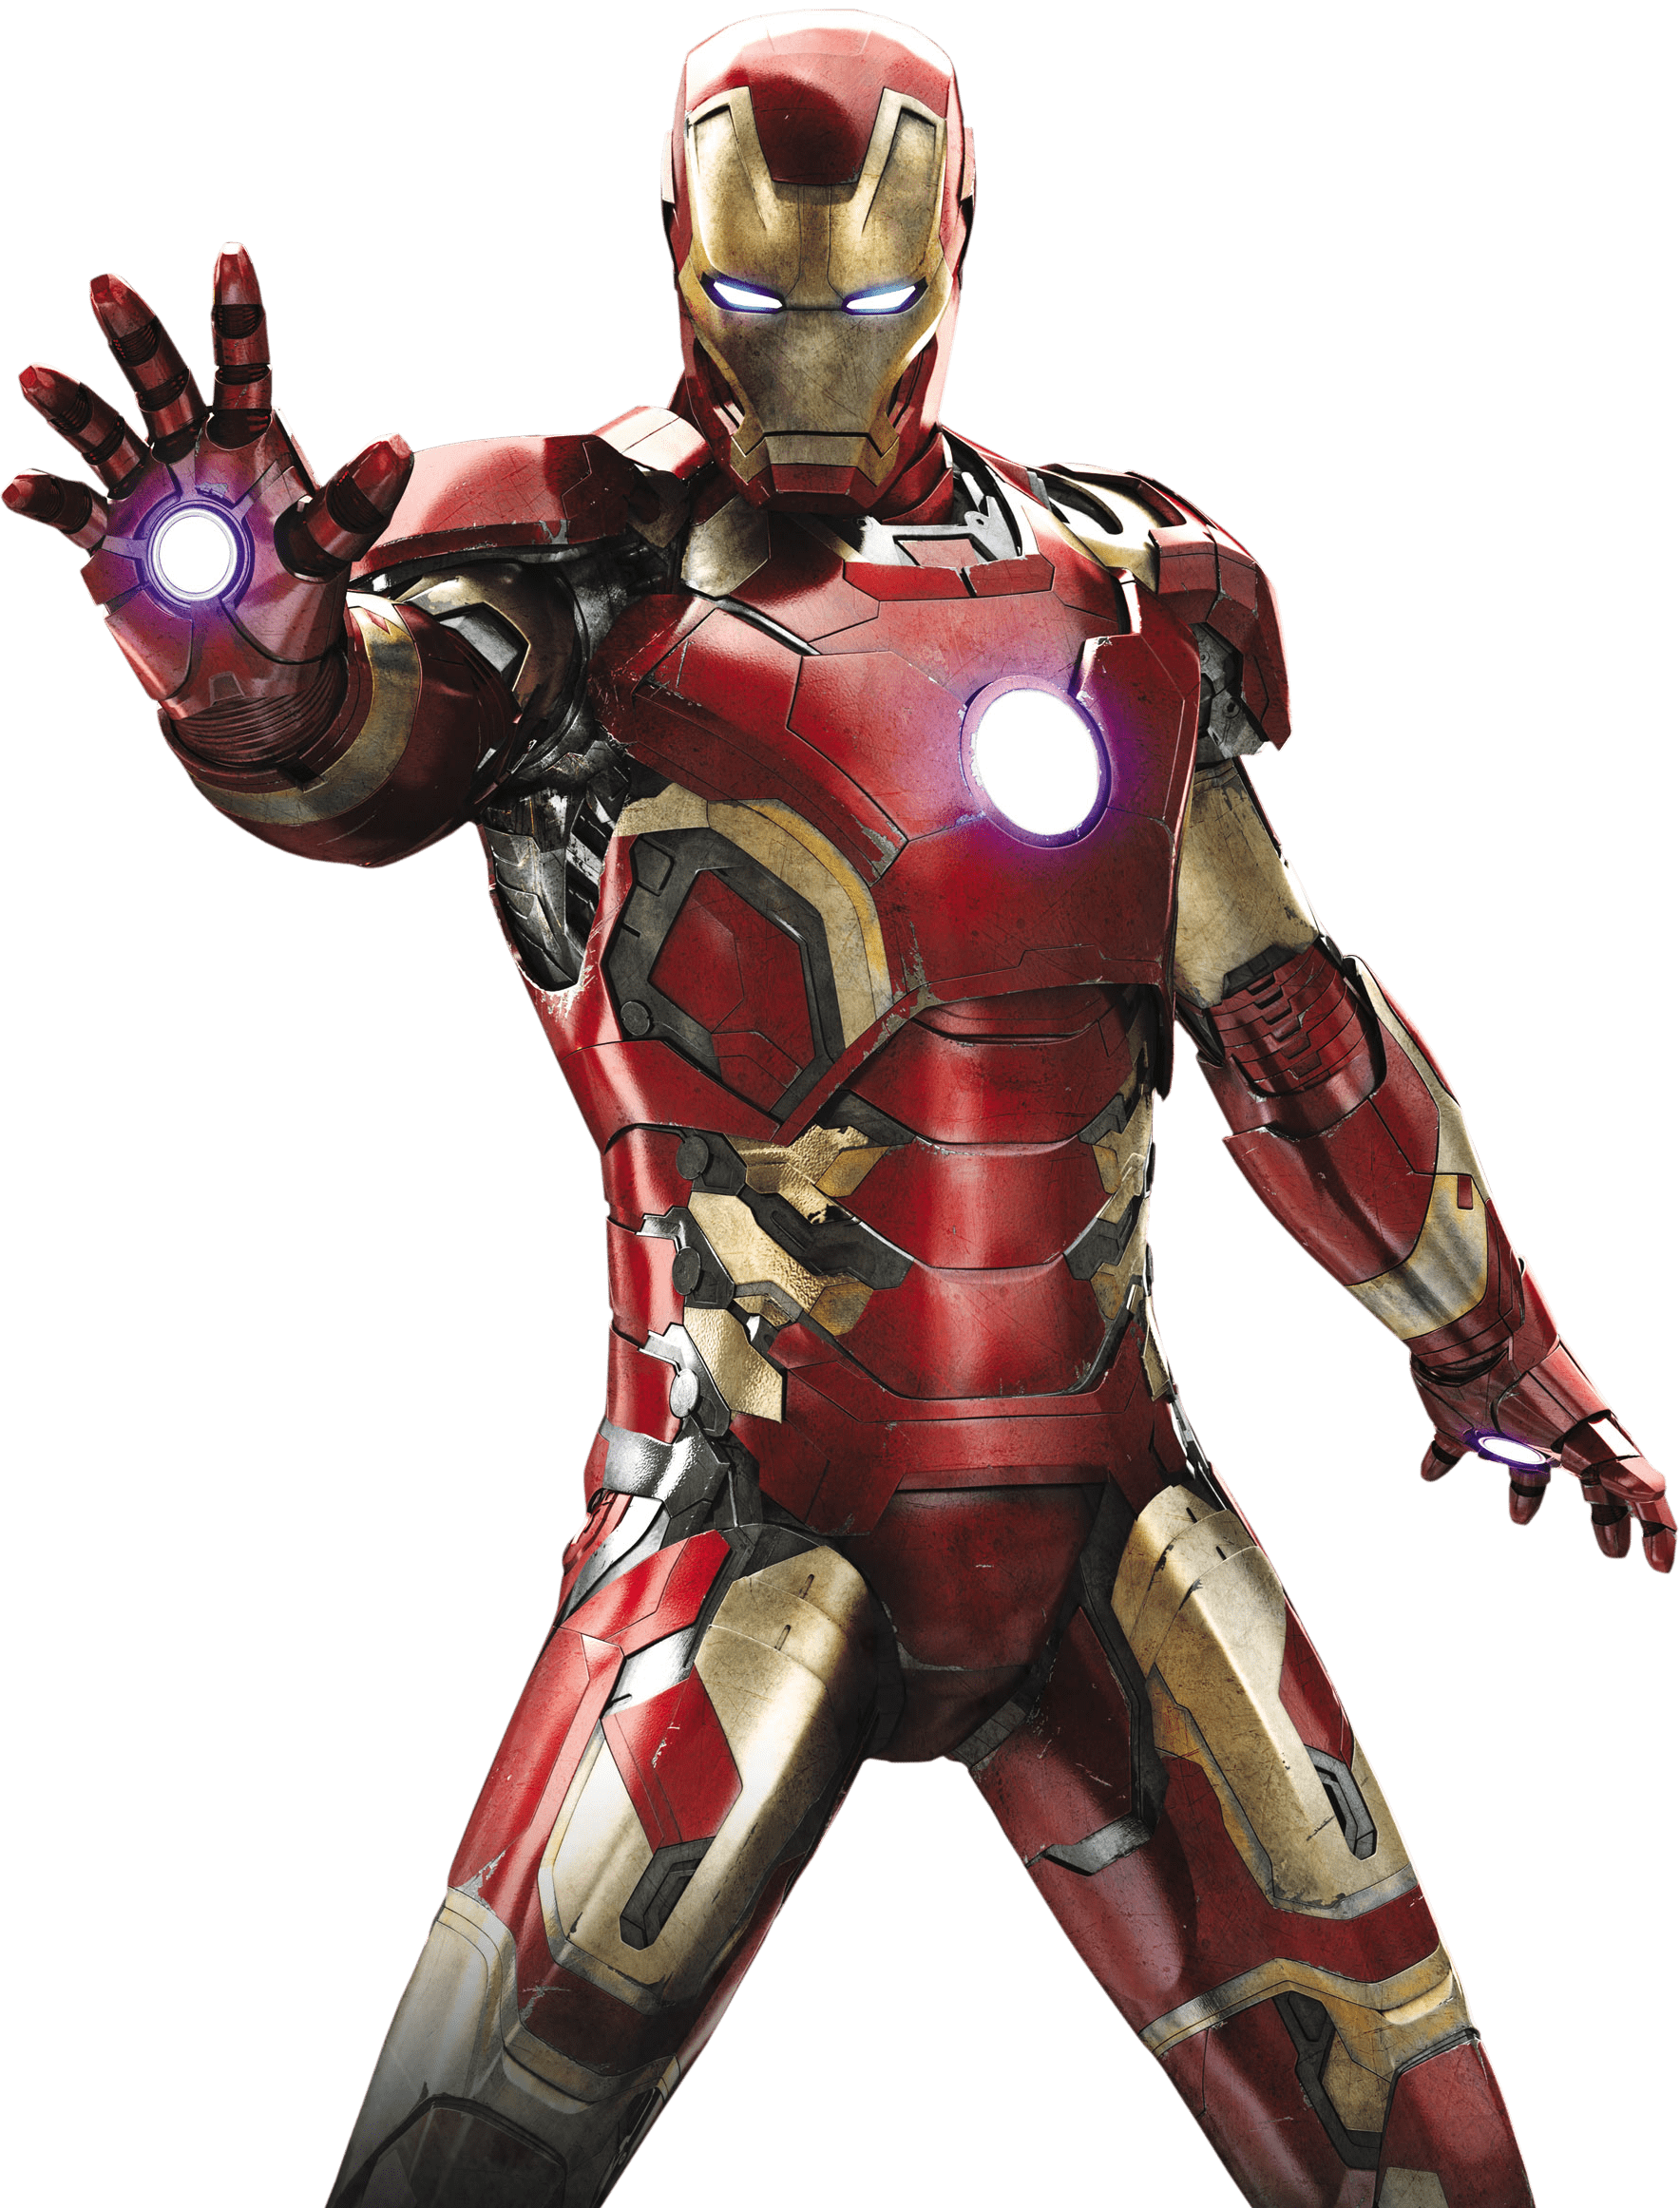 Iron Man Standing - Iron Man PNG HD